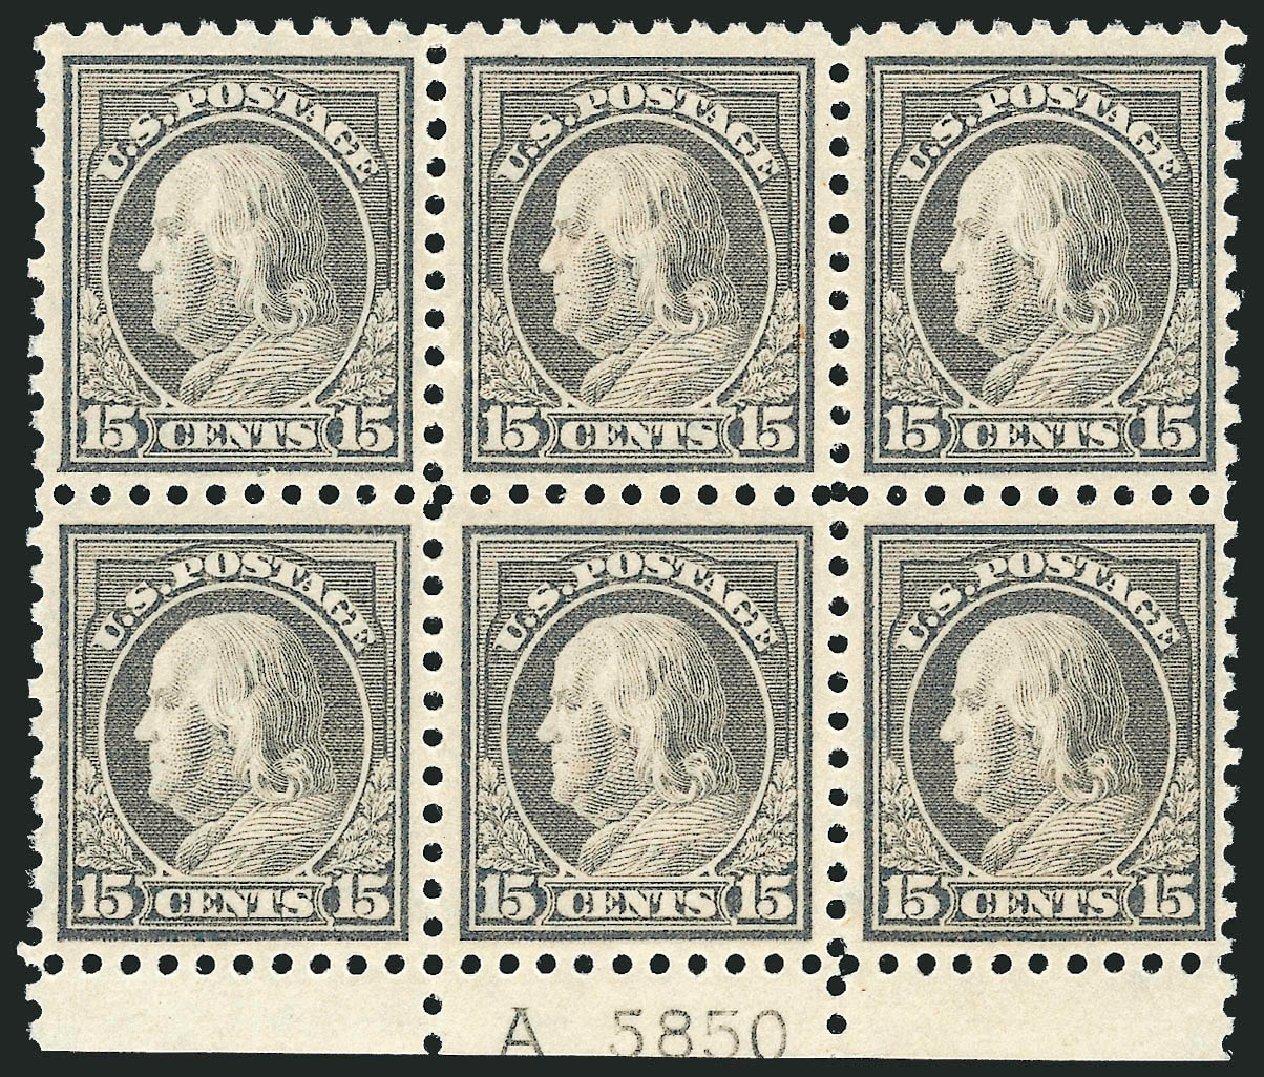 US Stamp Values Scott # 437 - 1914 15c Franklin Perf 10. Robert Siegel Auction Galleries, Jul 2014, Sale 1077, Lot 269